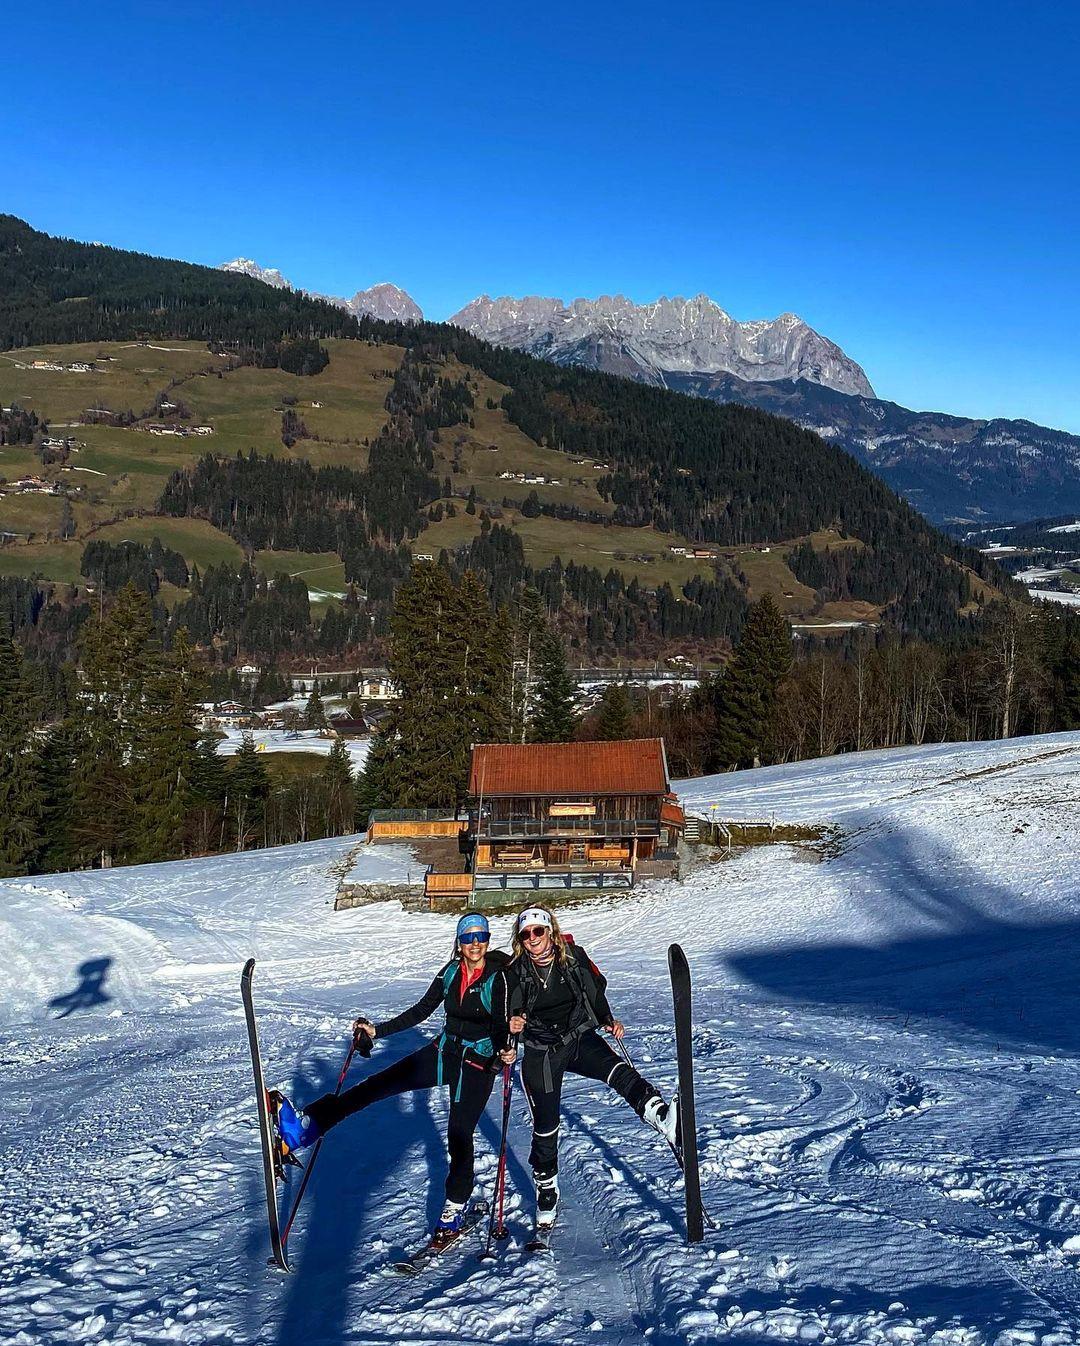 Hotel Mewah Kitzbuher Alpen Liburan Musim Salju